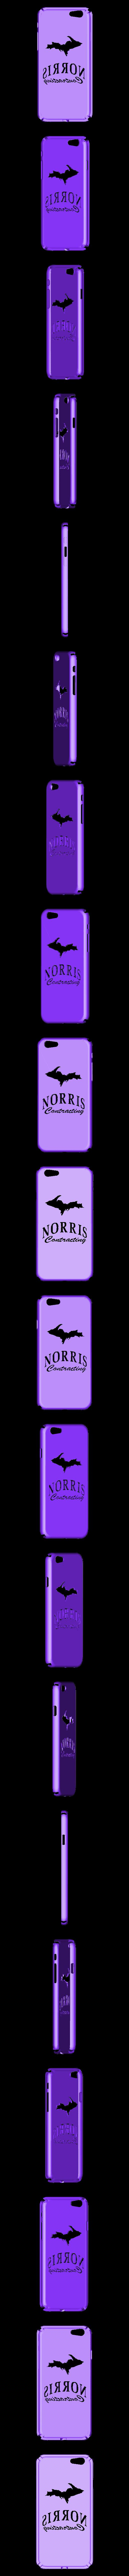 norris_2.0.stl Download free STL file Norris Contracting Custom Phone Case • Template to 3D print, mmjames